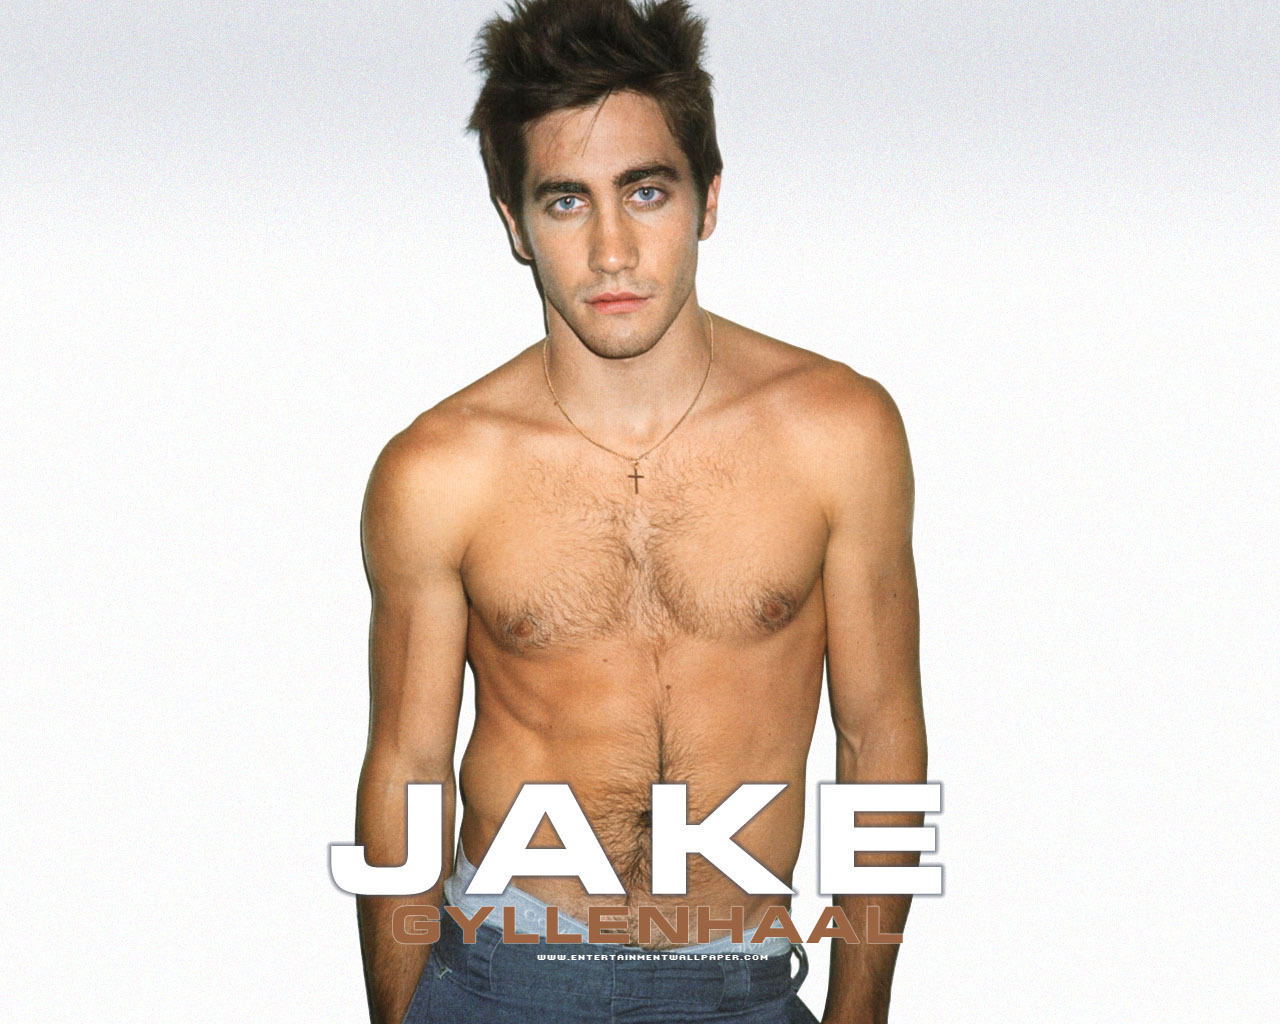 Jake Gyllenhaal - Hott...